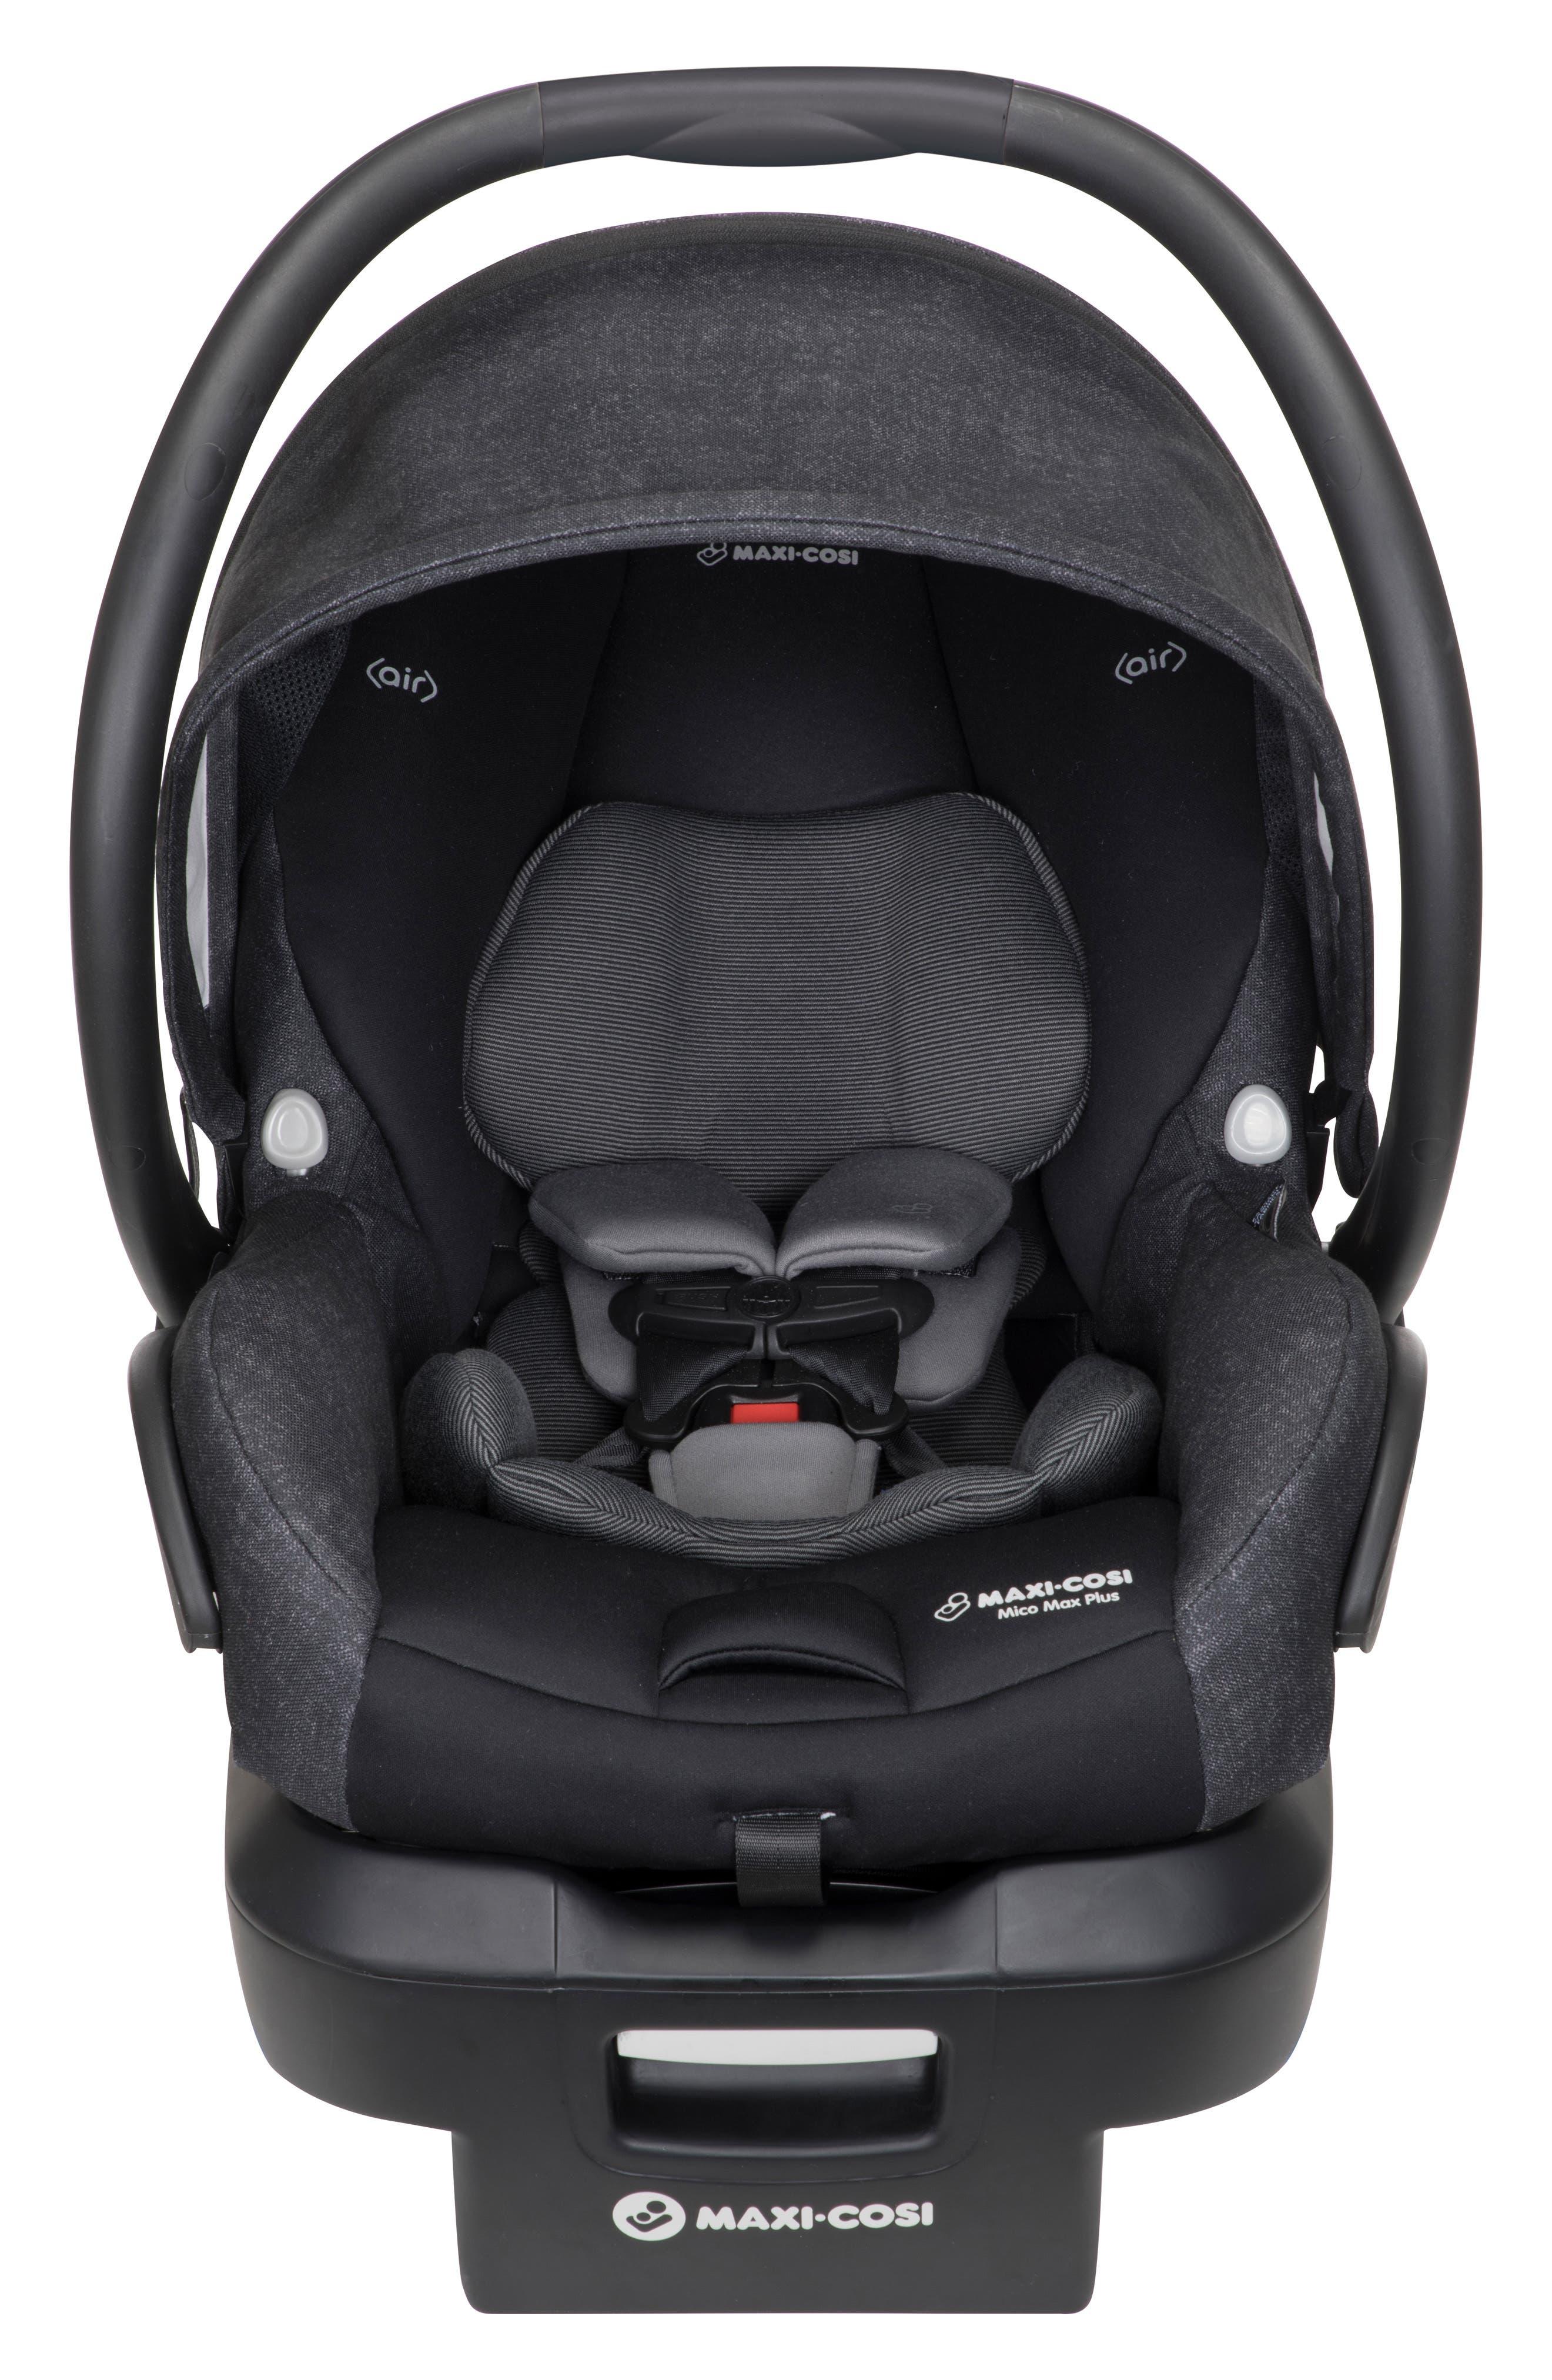 Infant MaxiCosi Mico Max Plus Infant Car Seat